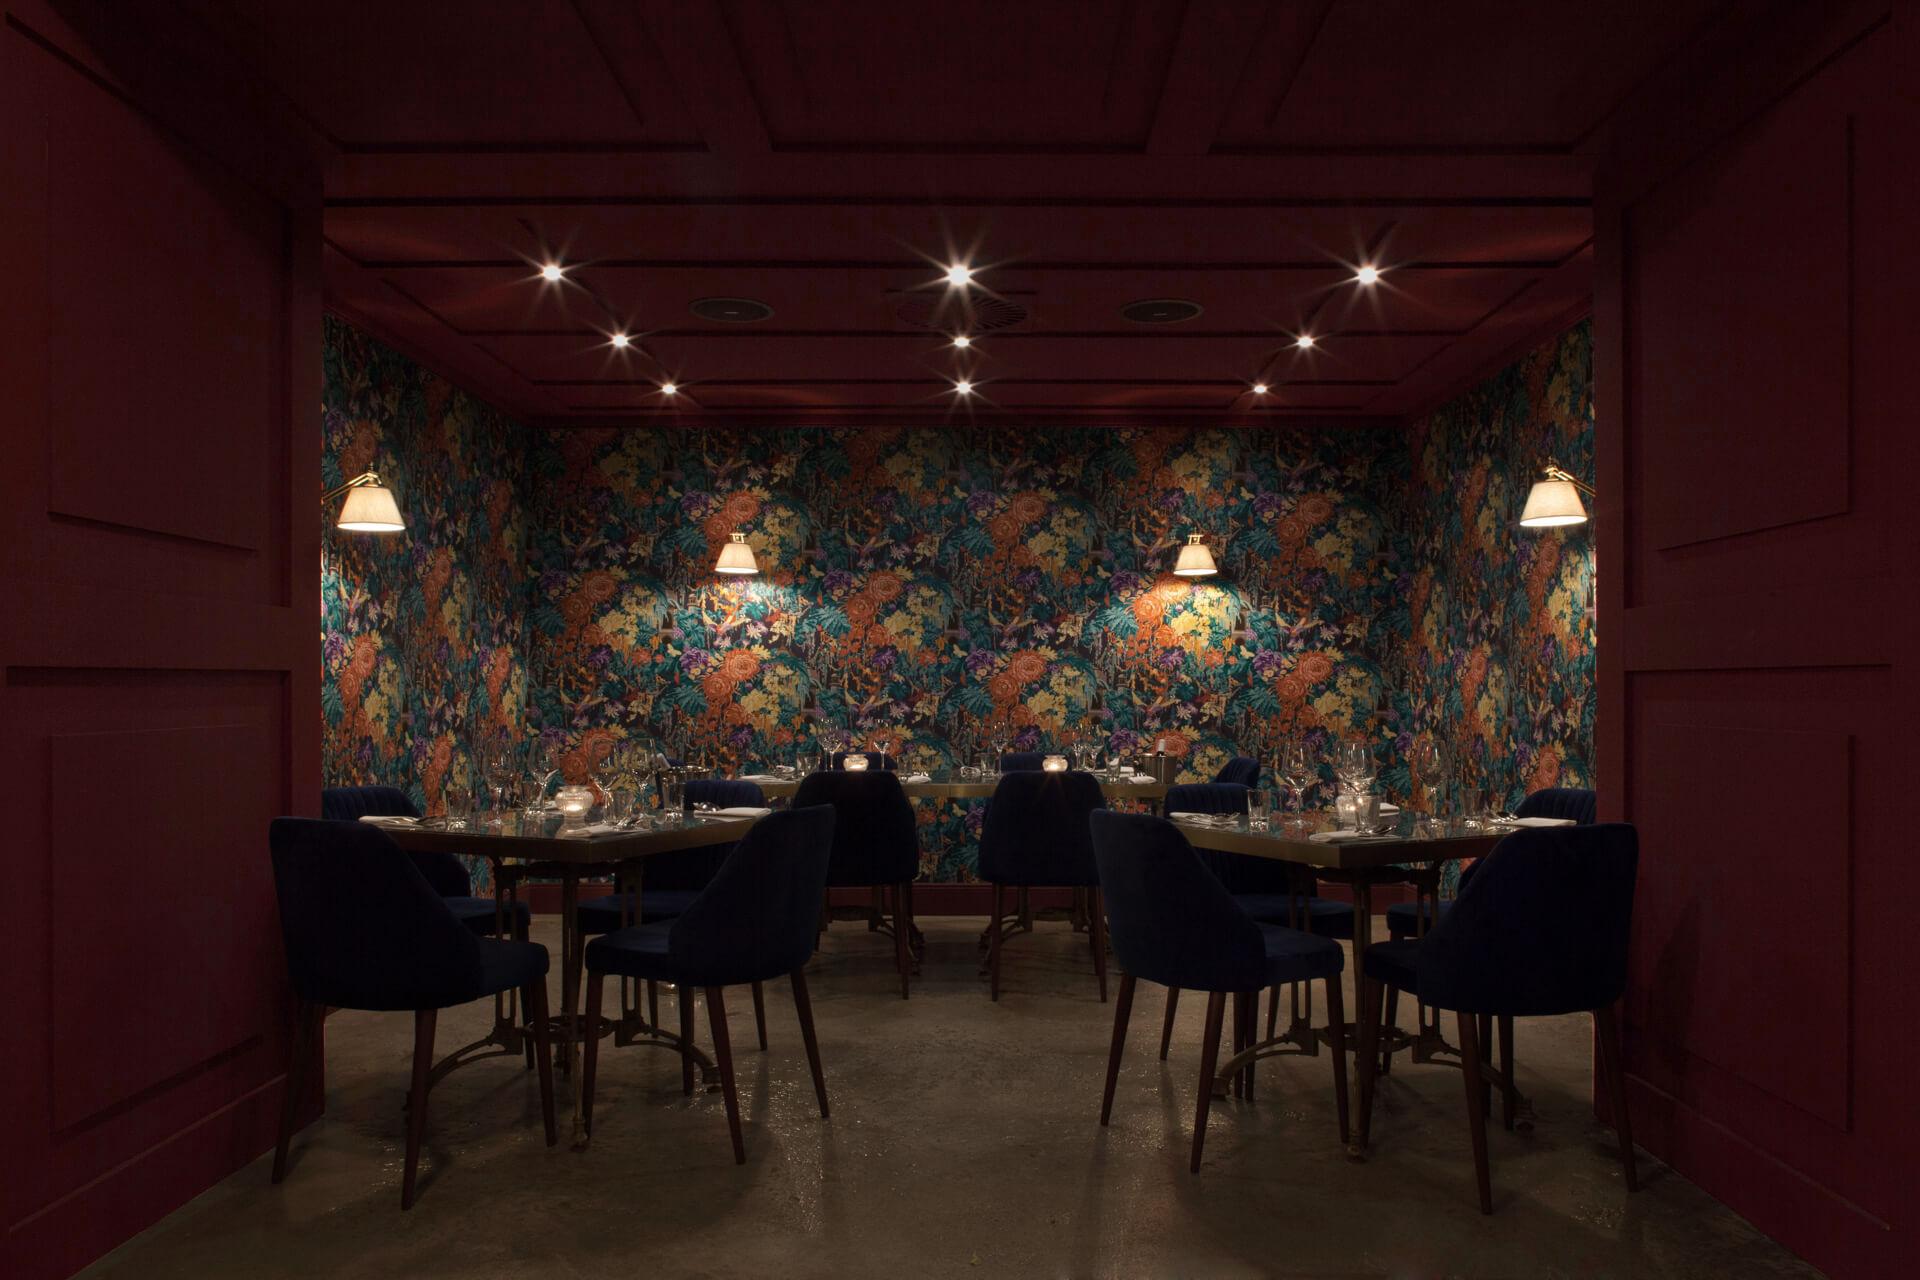 18_LIUC_TinnappelMetz_Restaurant_099_pt 1